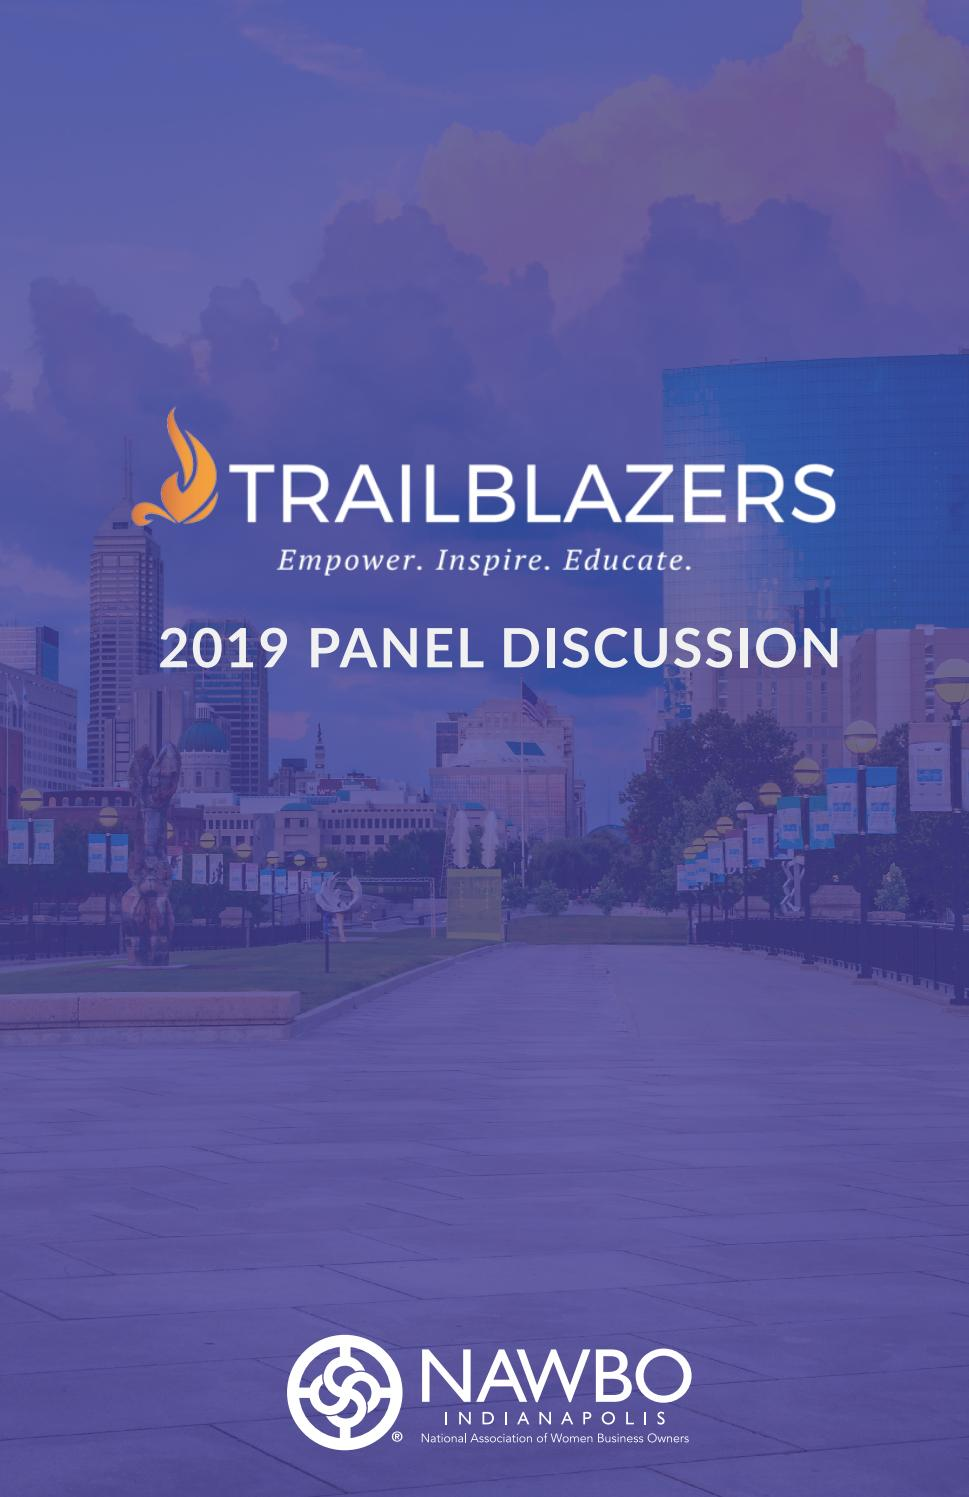 NAWBO-Indianapolis 2019 Trailblazers by nawboindy - issuu